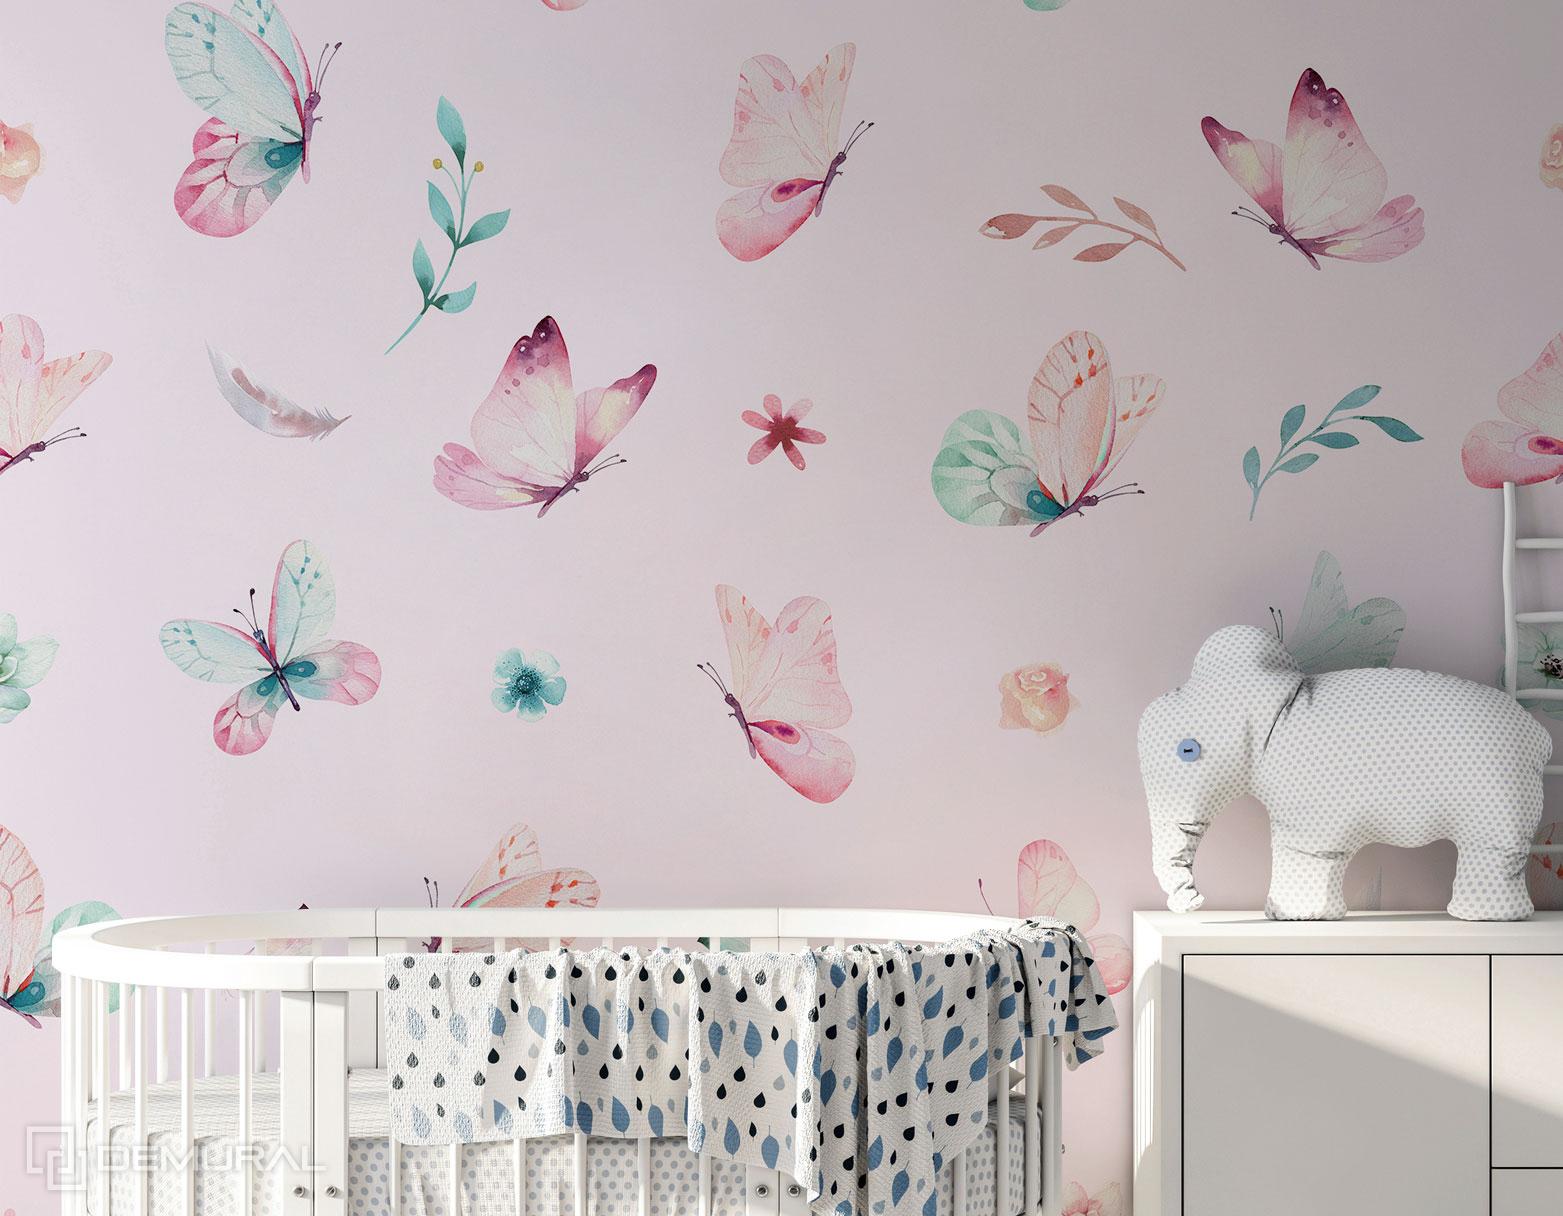 Fototapete Tanz der Schmetterlinge - rosa Fototapete - Demural